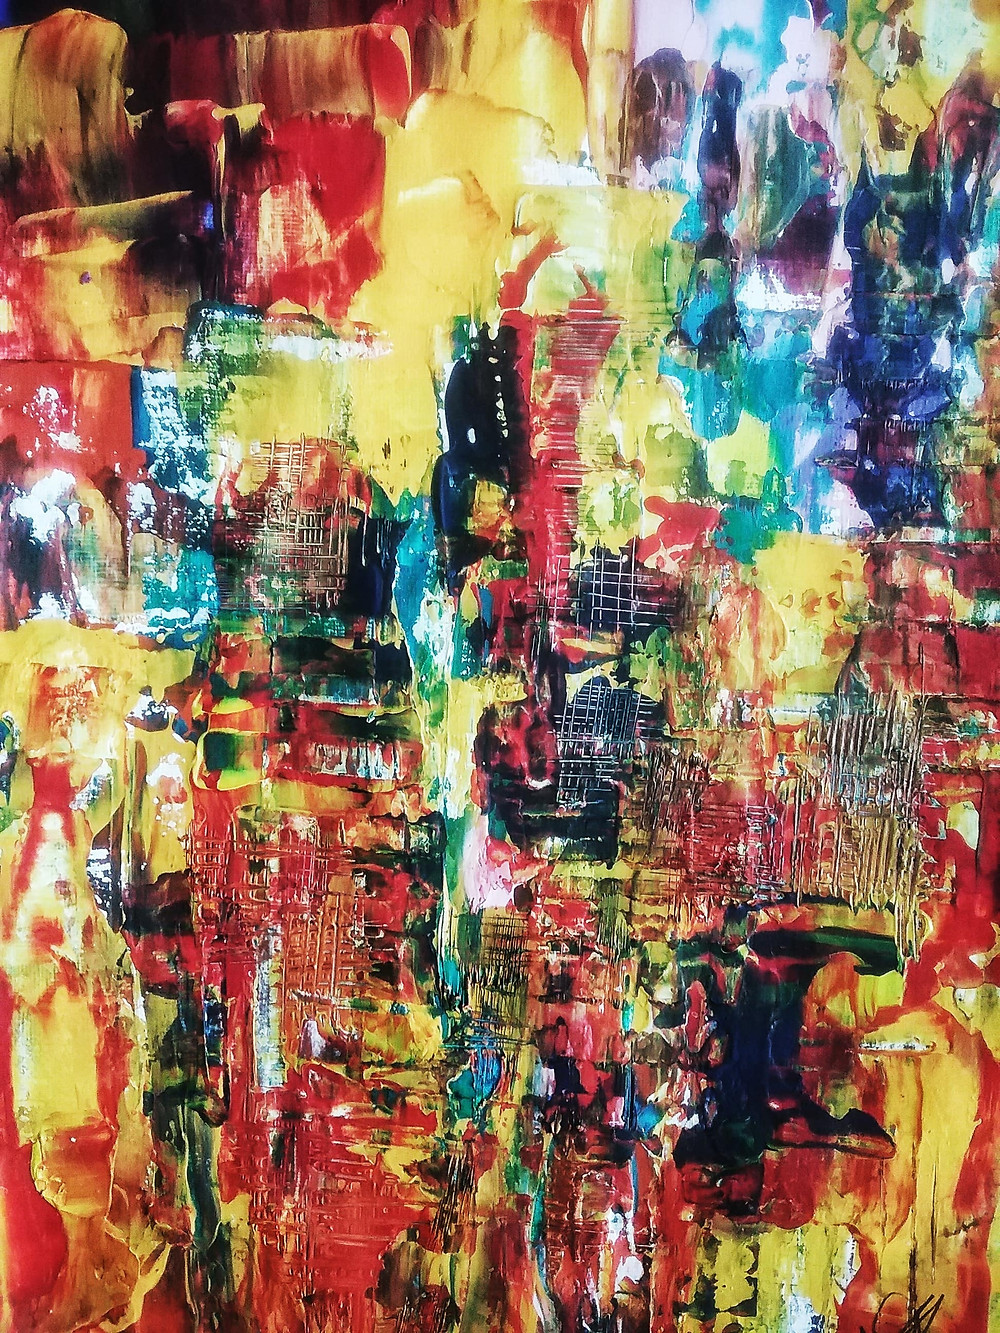 Abstrat paining wall art